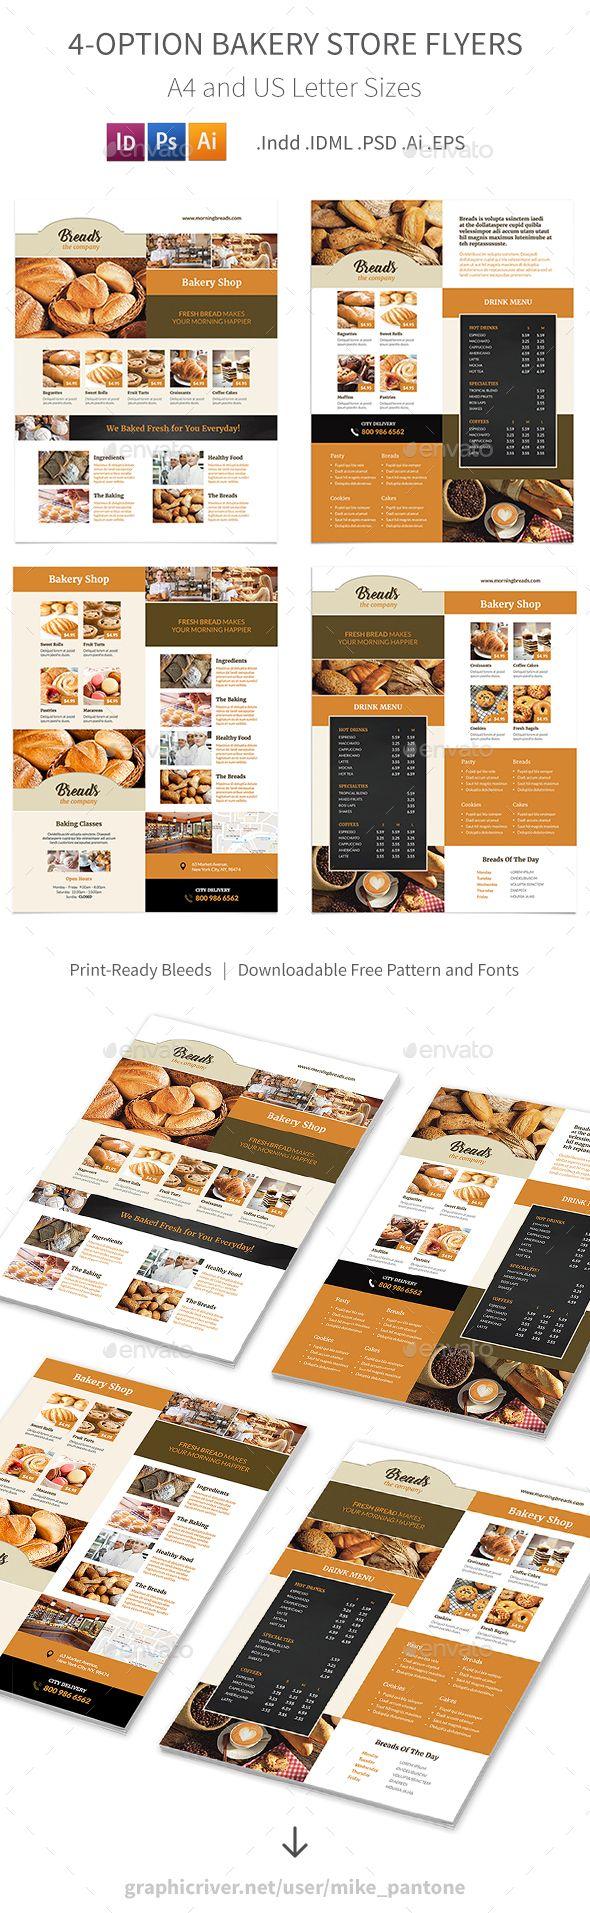 Bakery Store Flyers u2013 4 Options